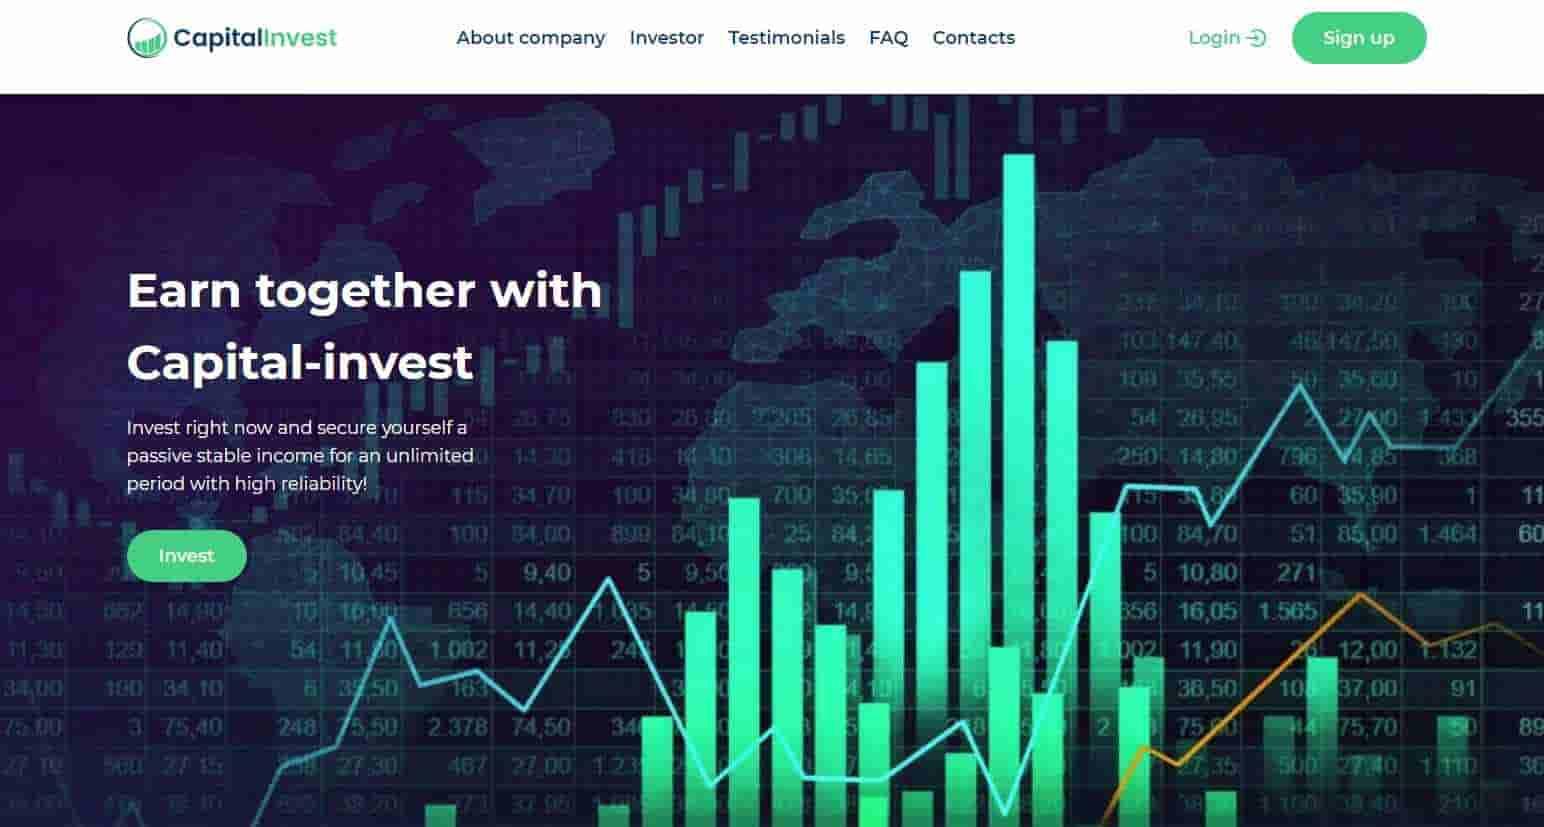 Capital-Invest